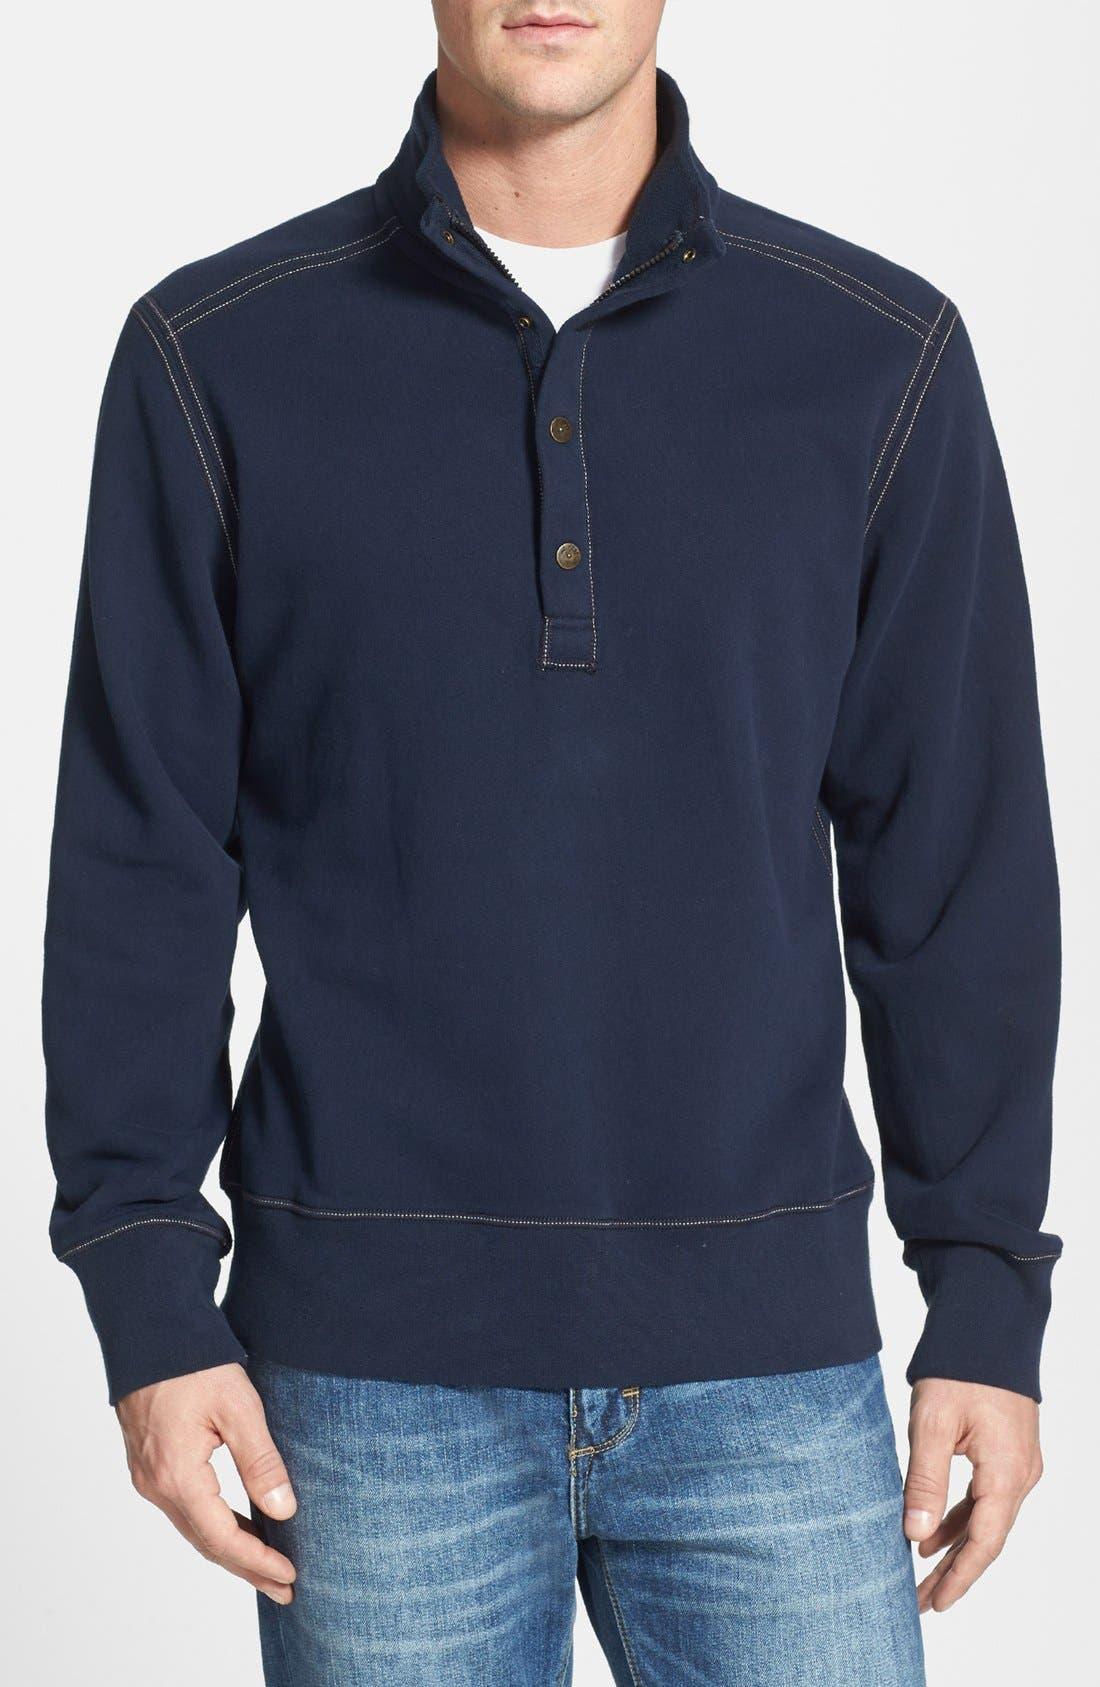 Alternate Image 1 Selected - Tommy Bahama Denim 'Explorer' Half Zip Sweatshirt